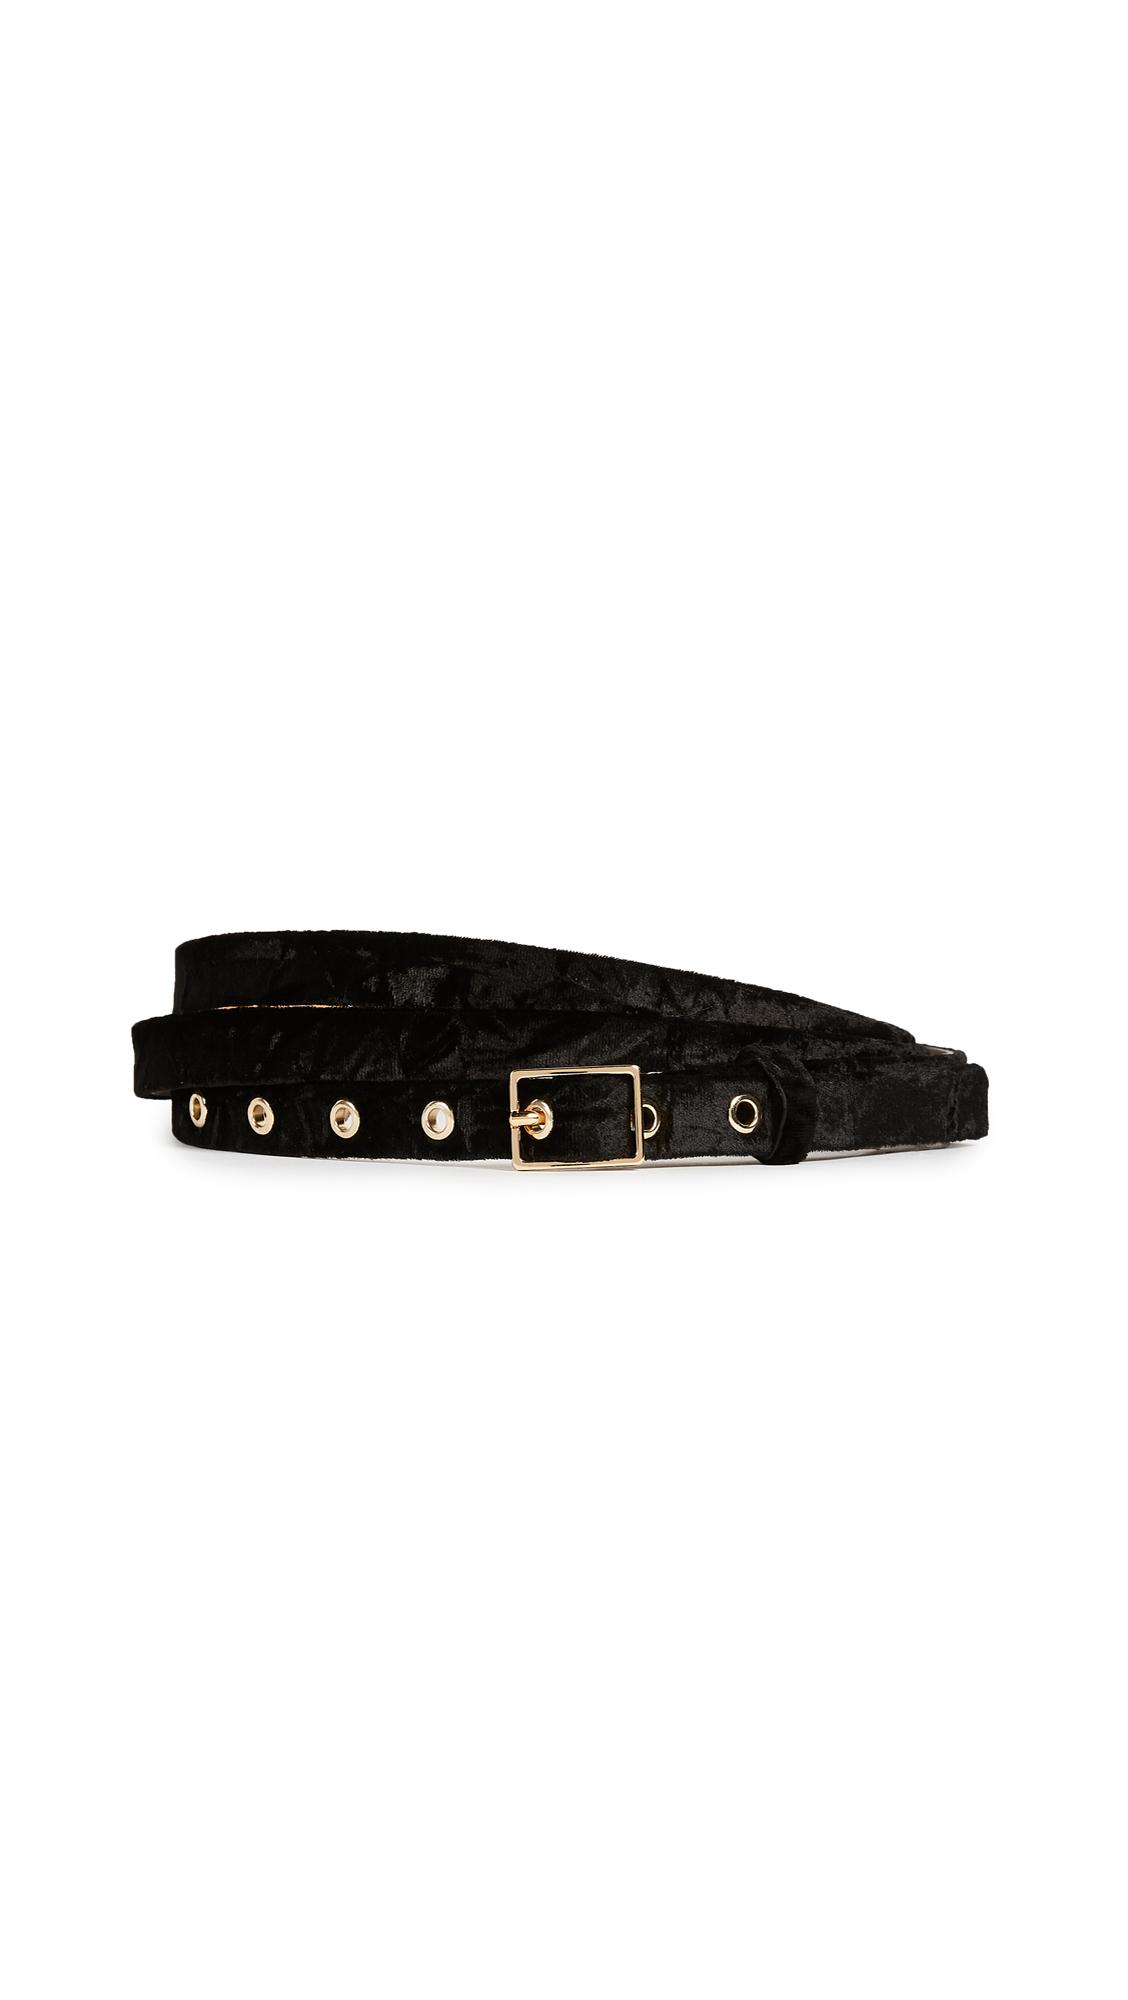 Rebecca Minkoff Liv Velvet Double Wrap Belt - Black/Nickel